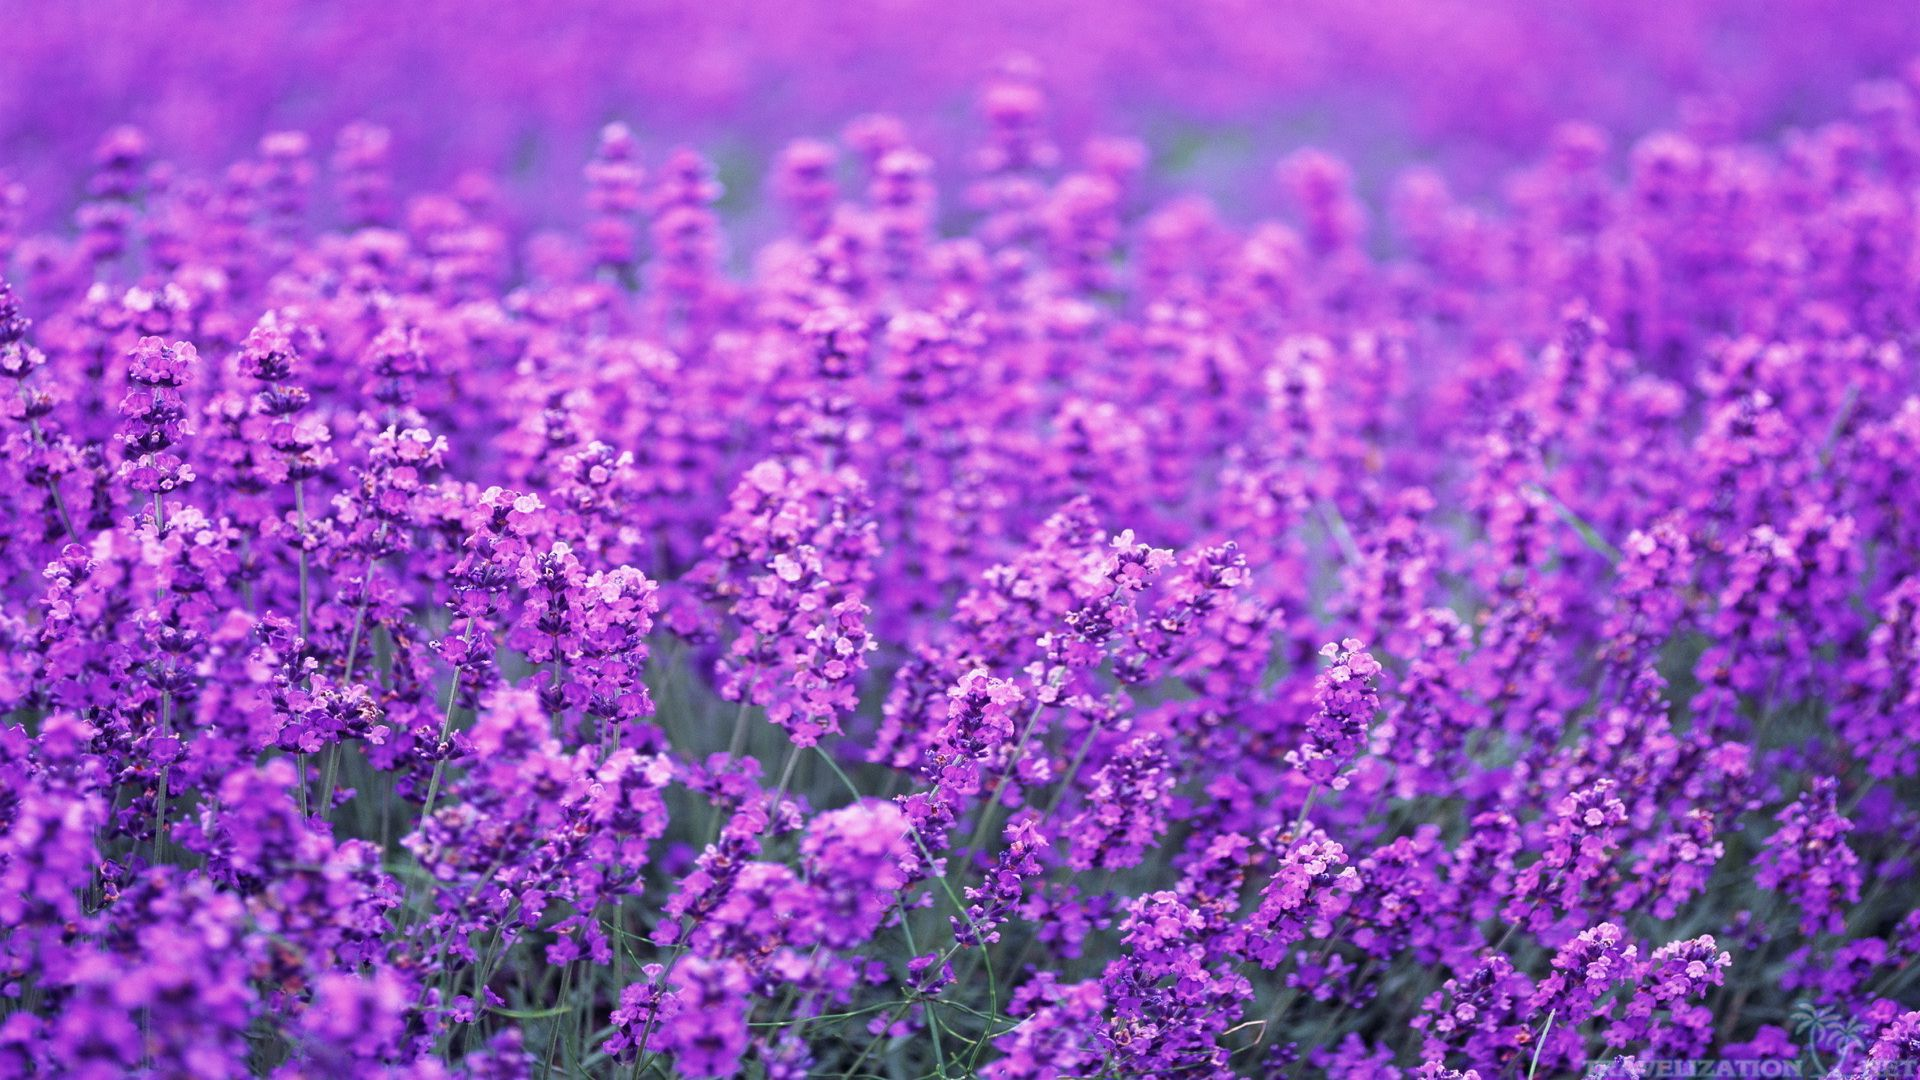 Beautiful Lavender Flowers HD Wallpaper 1691 Wallpaper 1920x1080